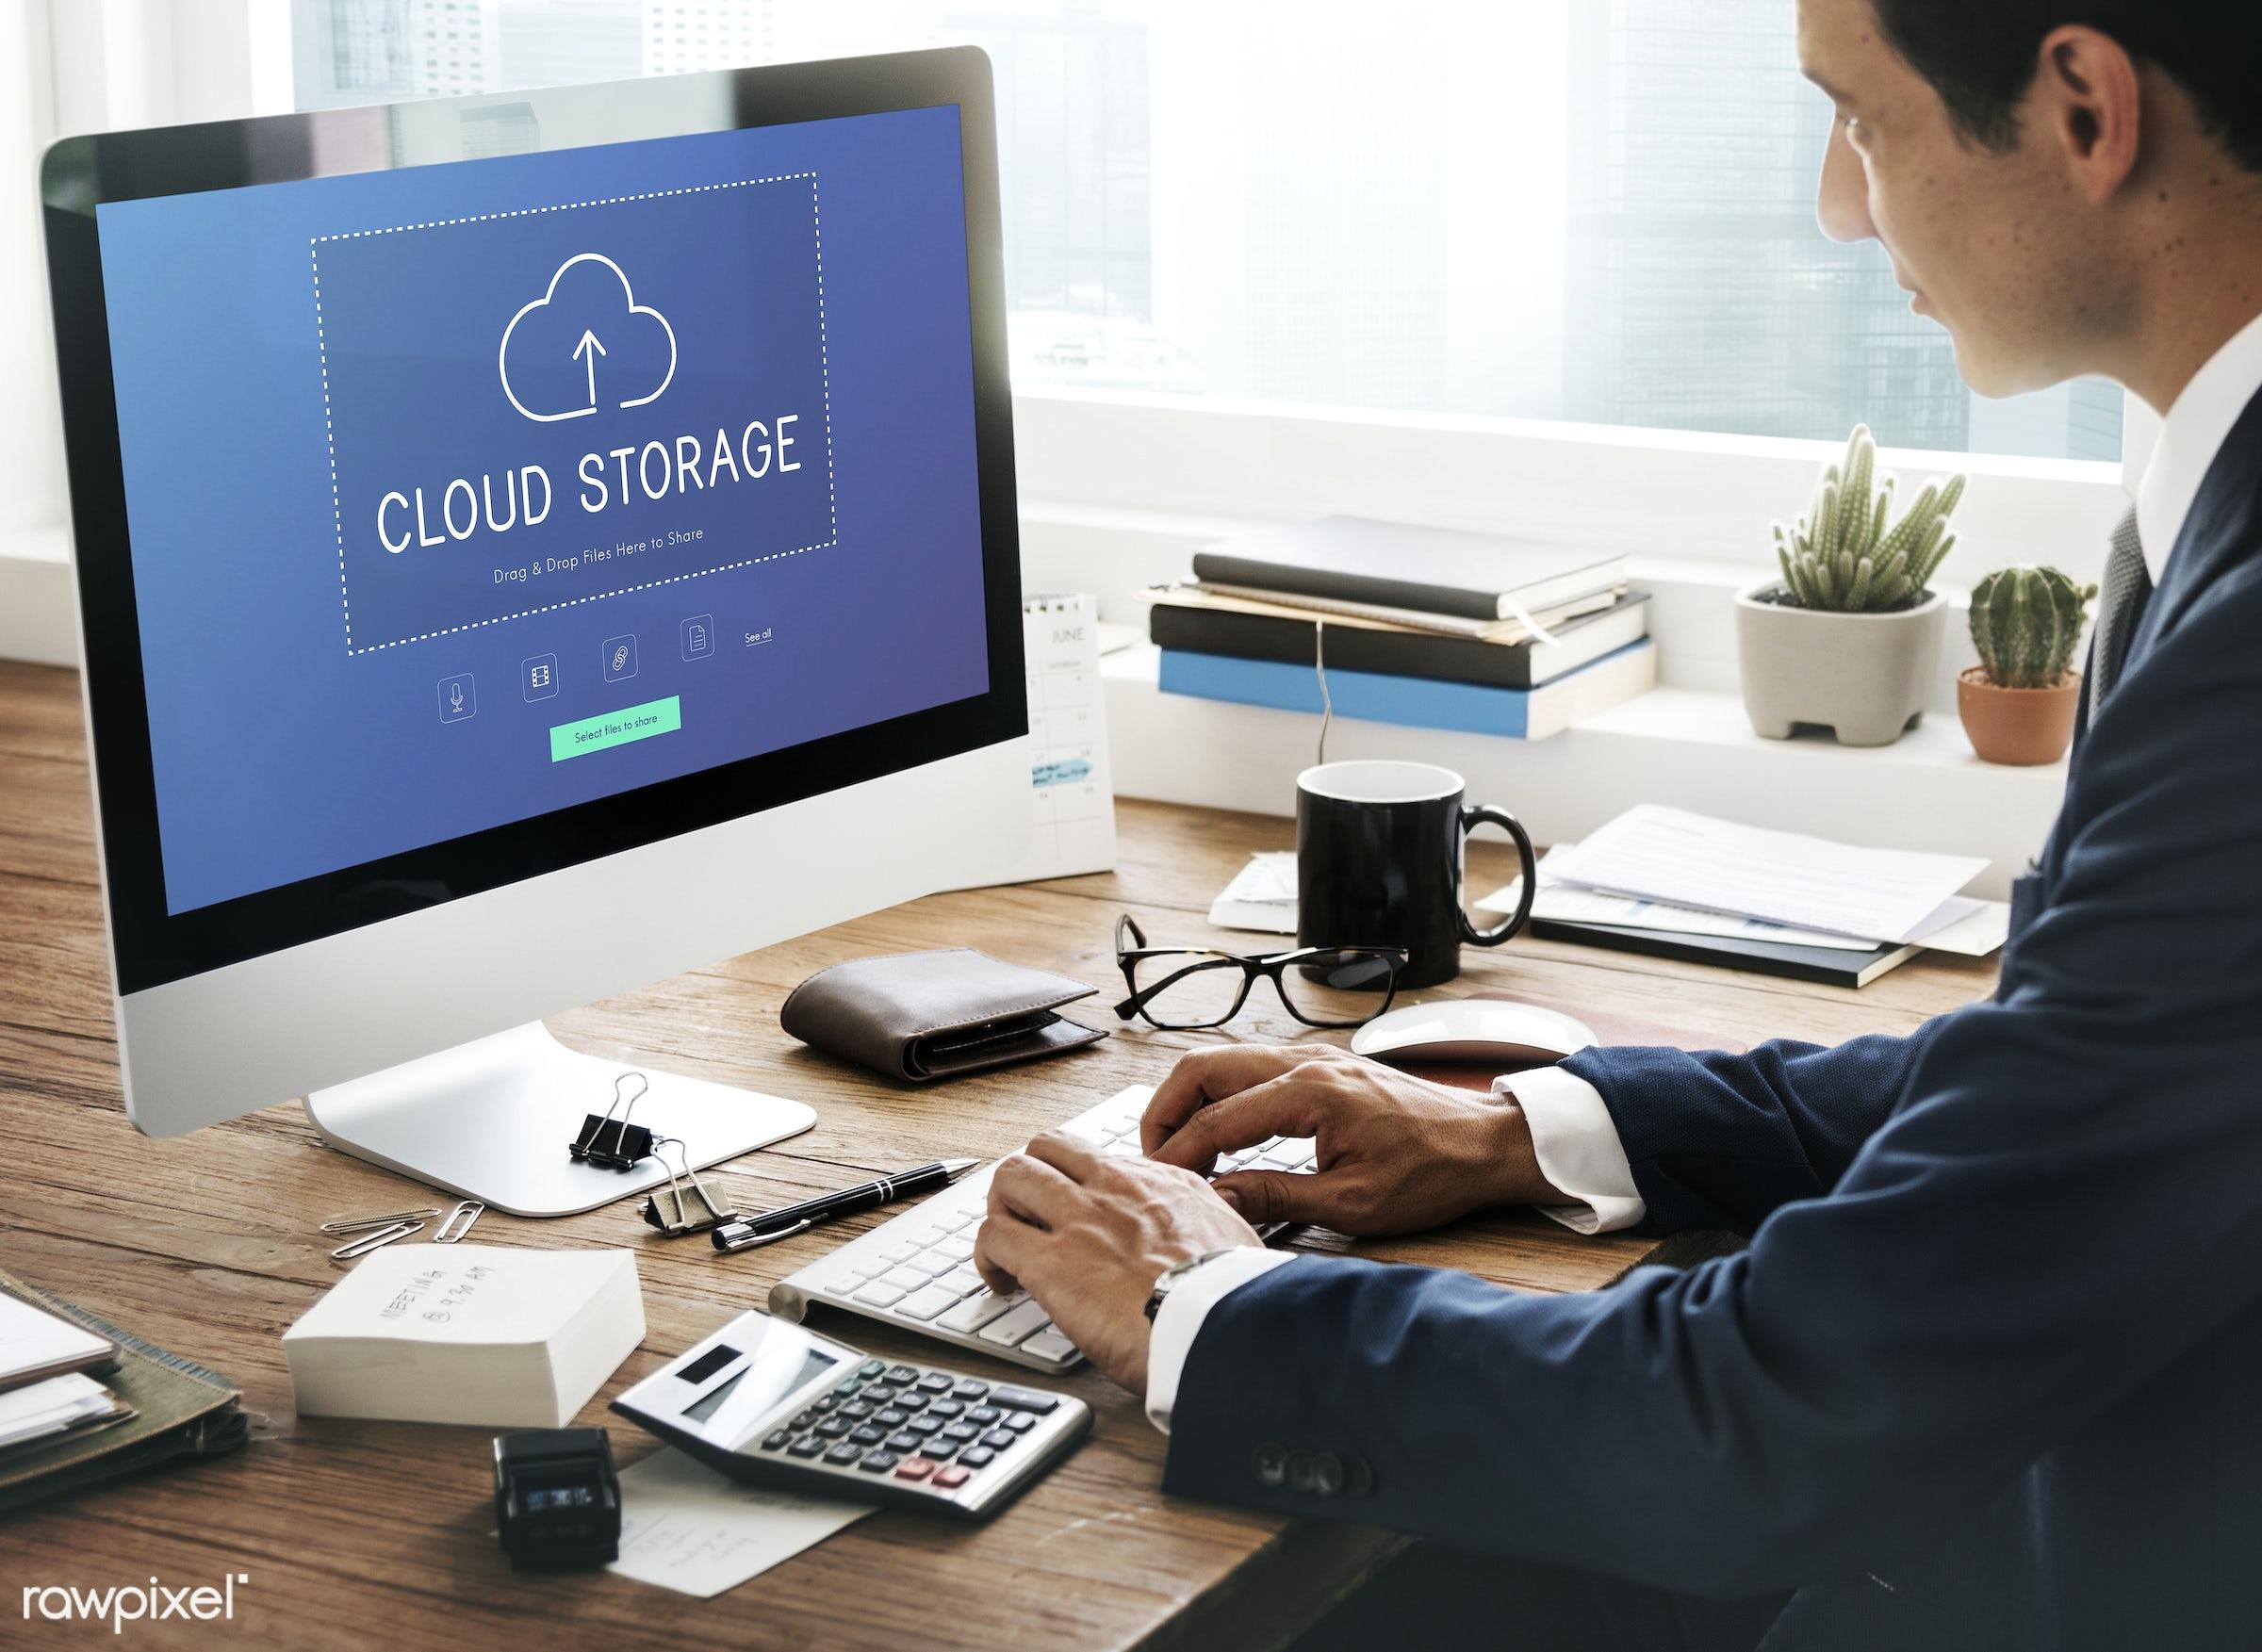 cloud, cloud computing, upload, backup, browse, business, business person, business plan, businessman, cloud network, cloud...